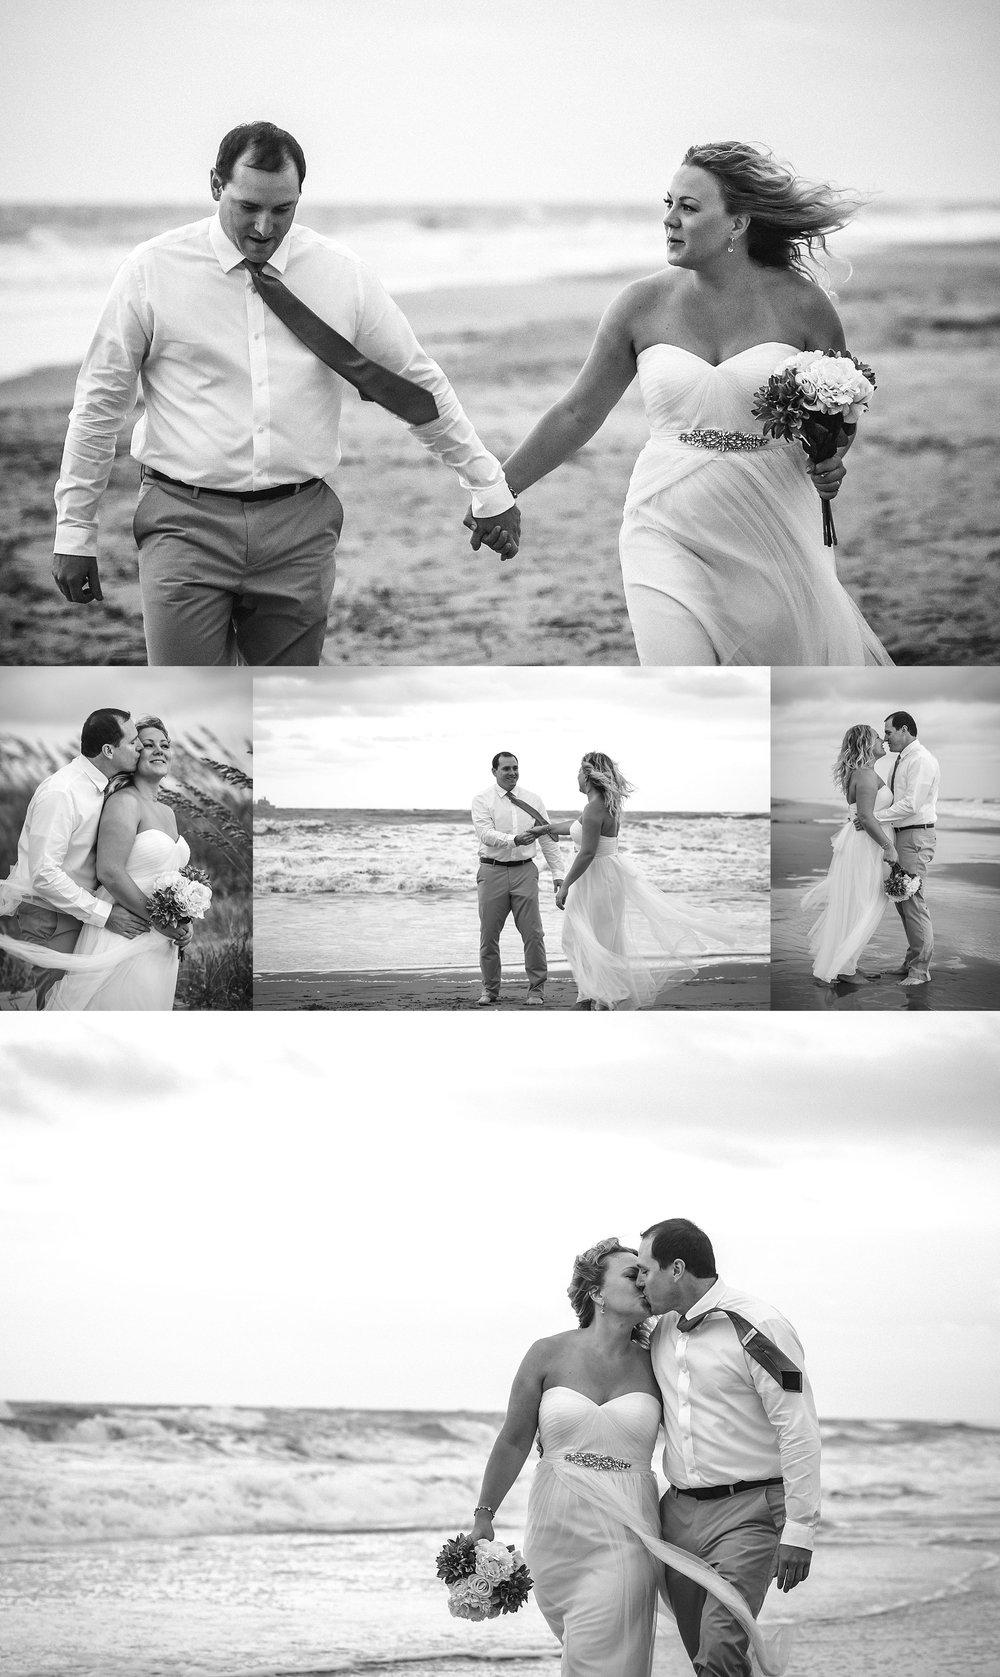 melissa-bliss-photography-beach-elopement-photography-va-weddings-norfolk-williamsburg-chesapeake-sandbridge-wedding-photographer